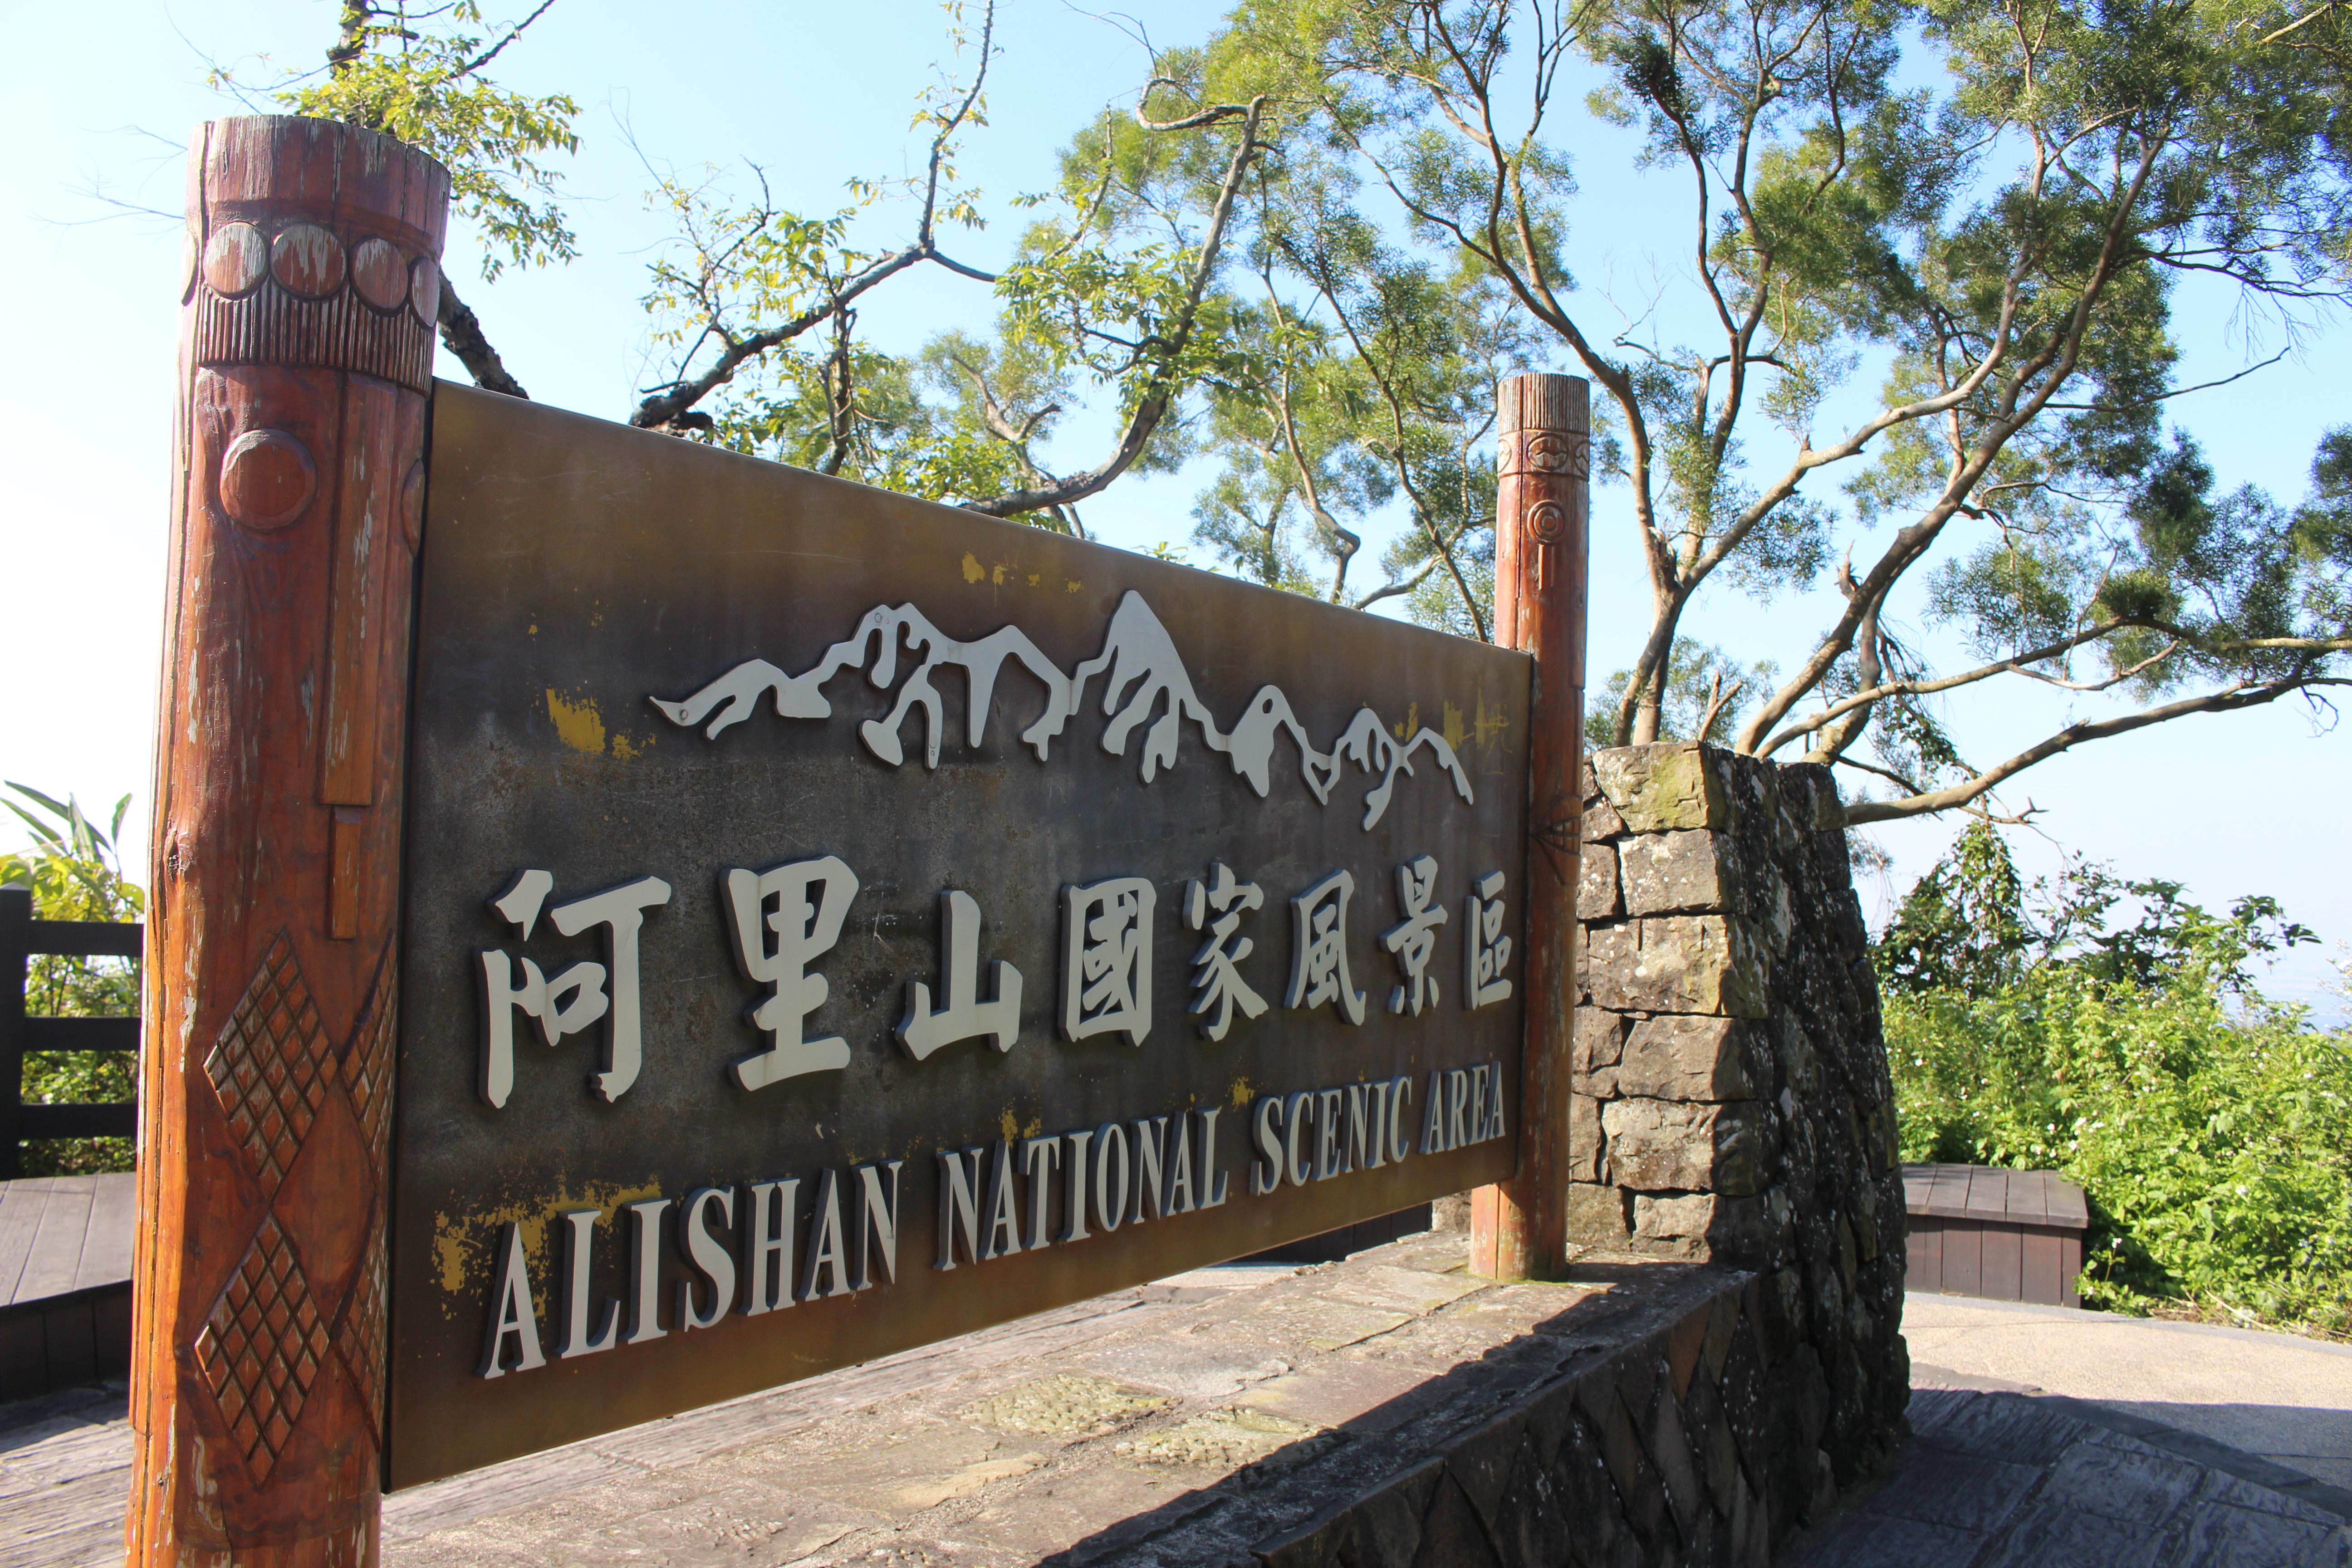 Alishan National Scenic Area sign 20160208a.jpg